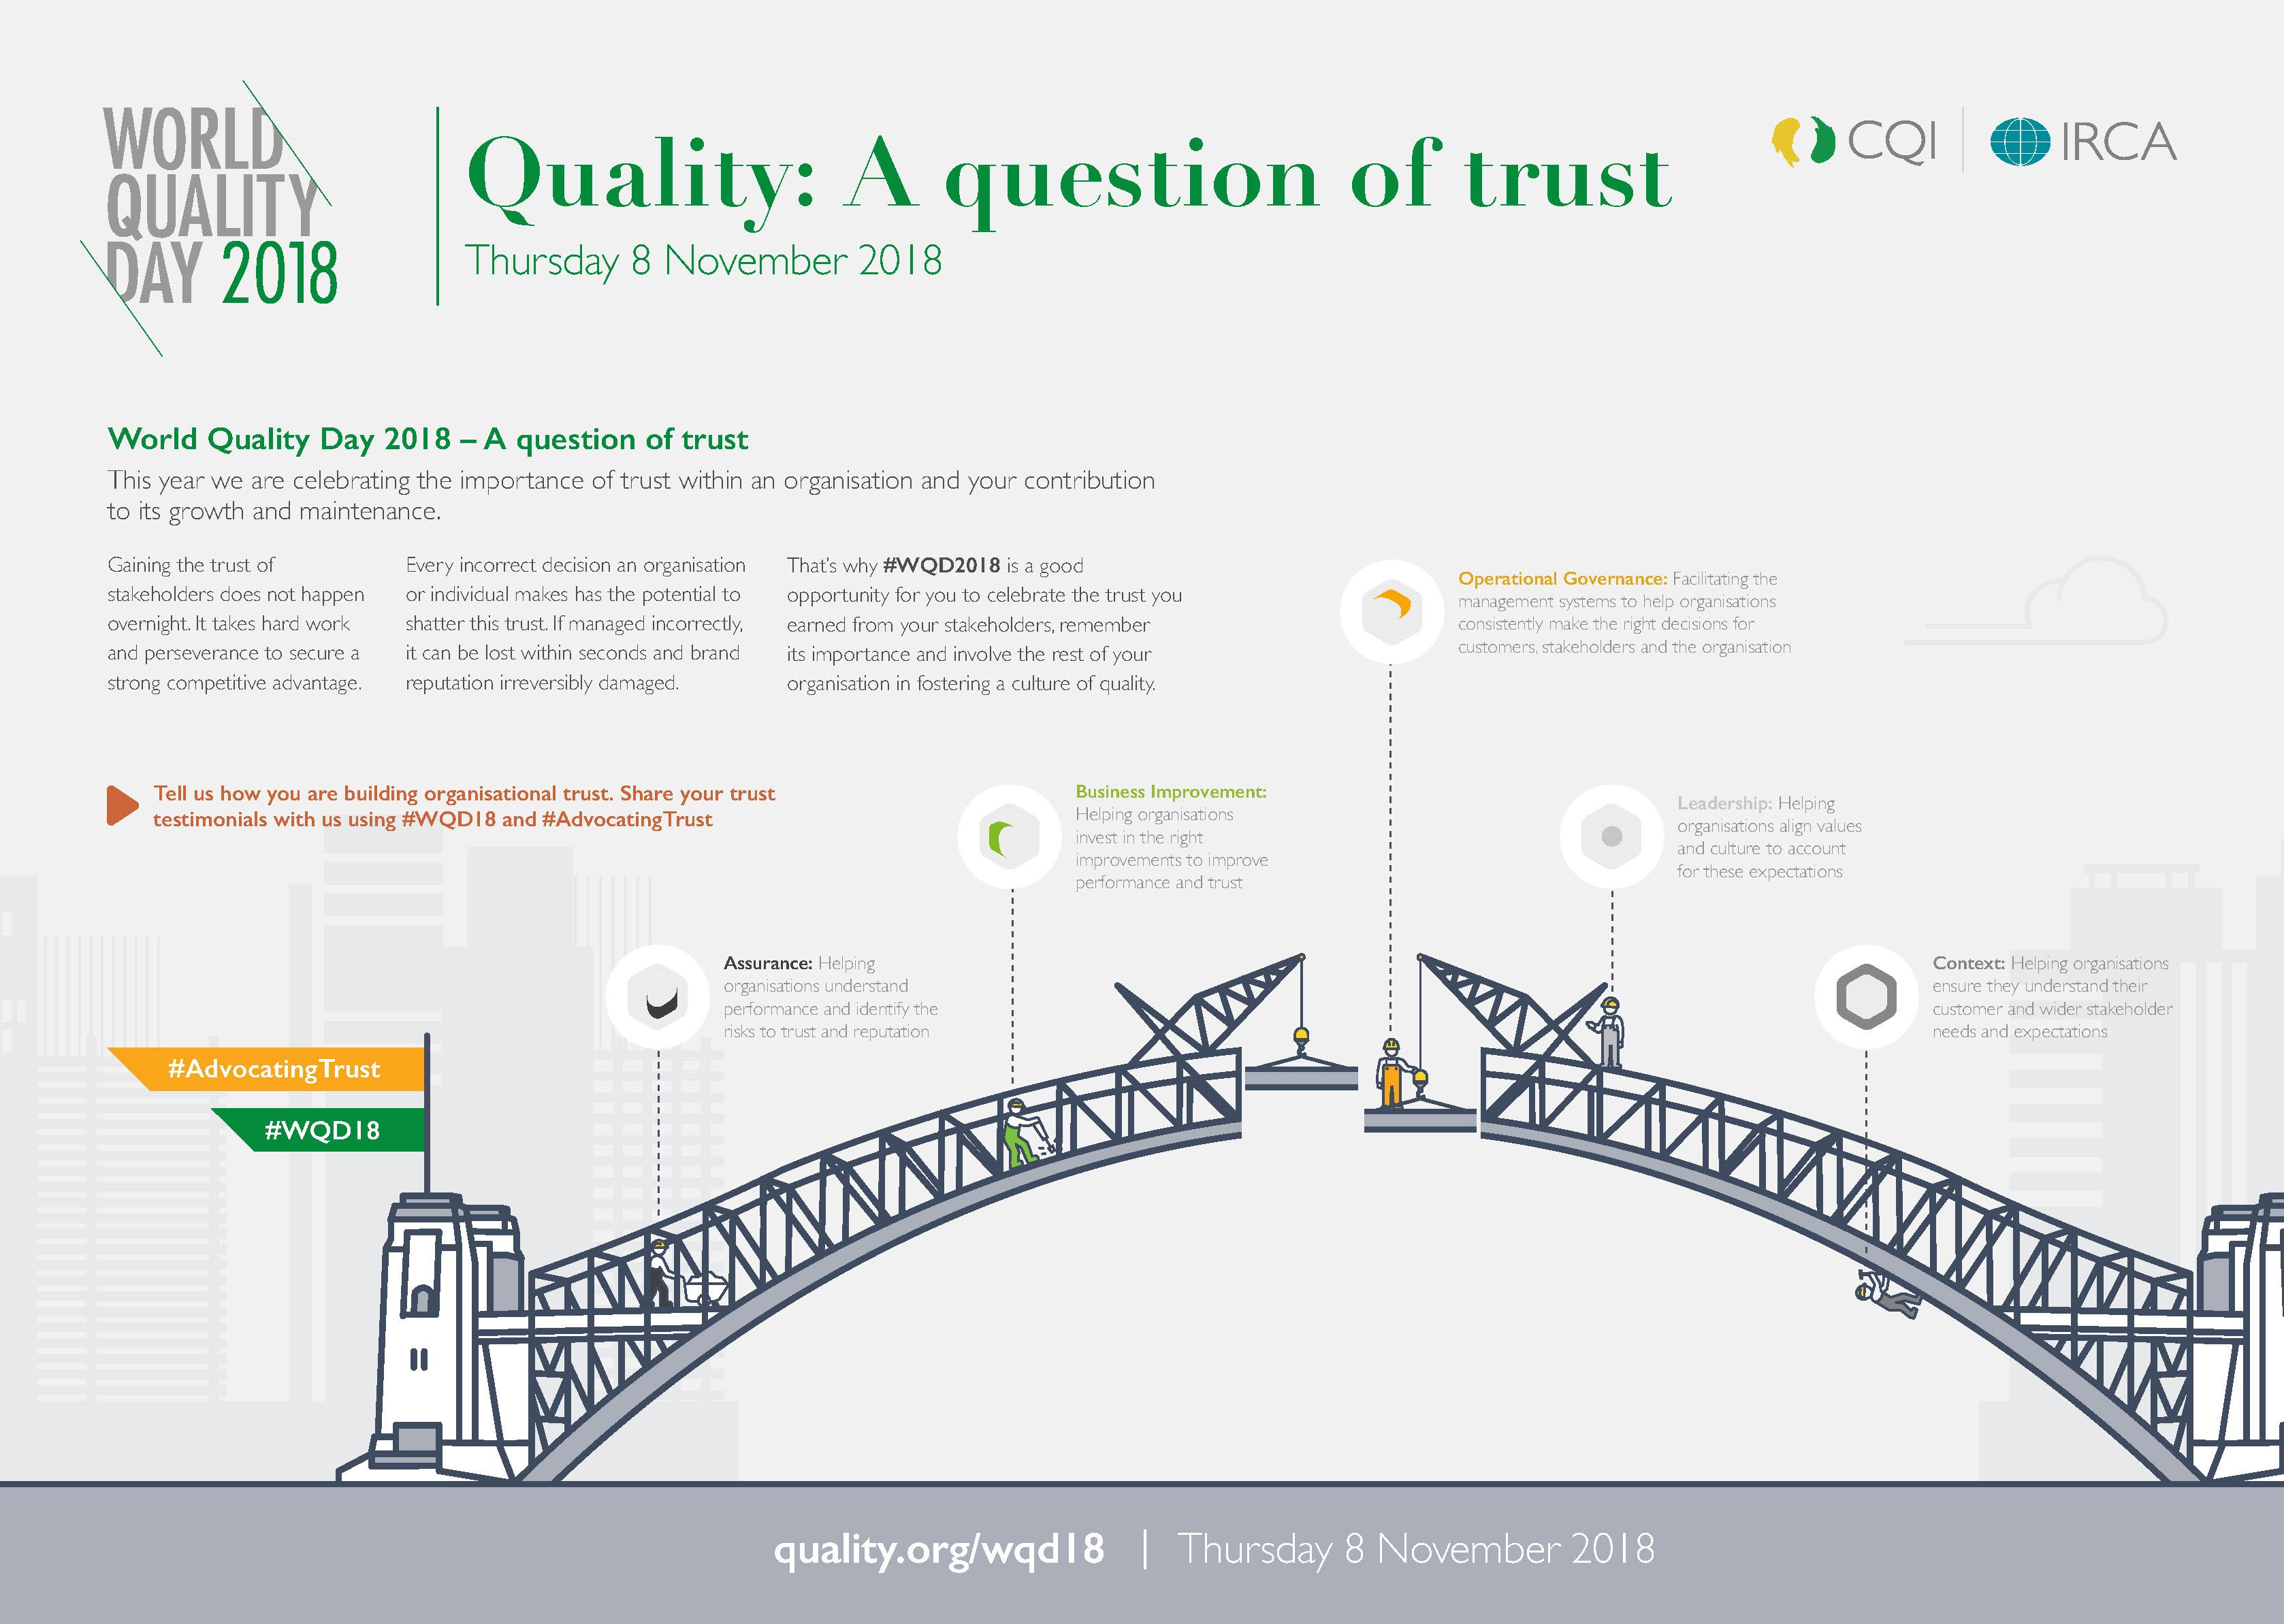 World Quality Day 2018